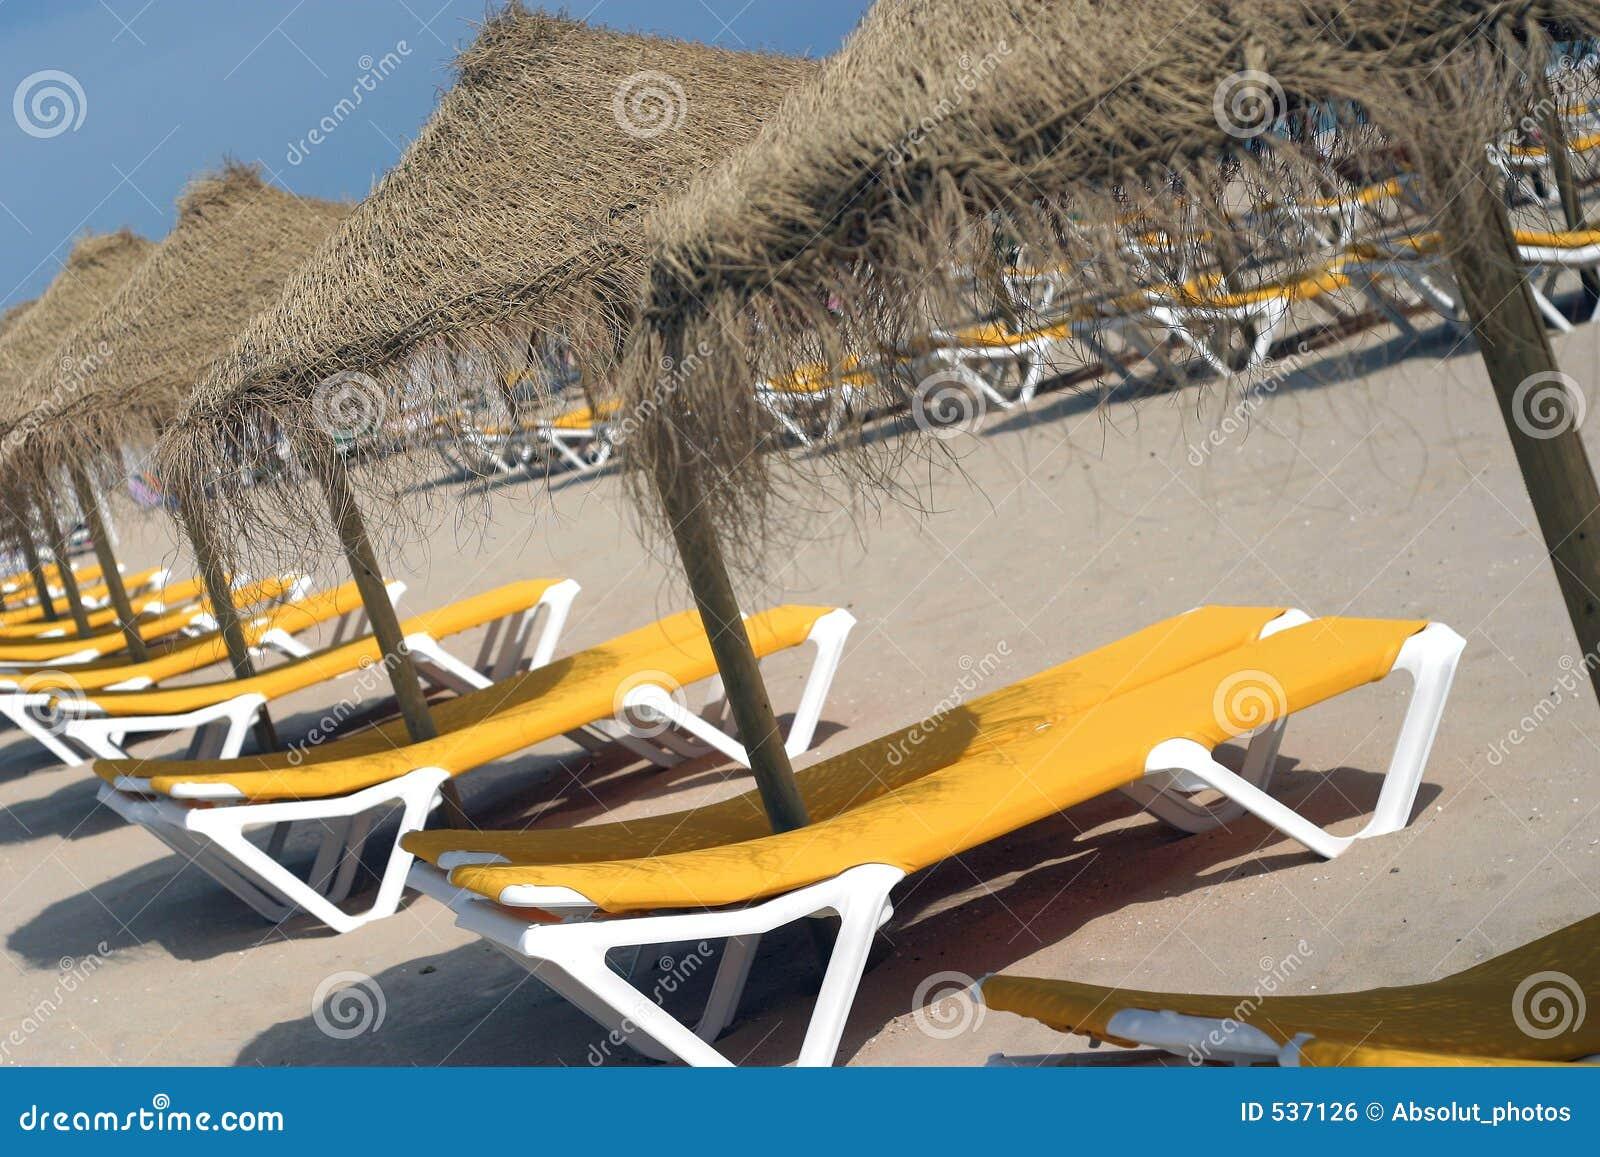 Download 海滩睡椅伞 库存照片. 图片 包括有 旅游业, 晒裂, 放松, 休闲, 海滨, 海运, 平安, 保护, 可躺式椅 - 537126